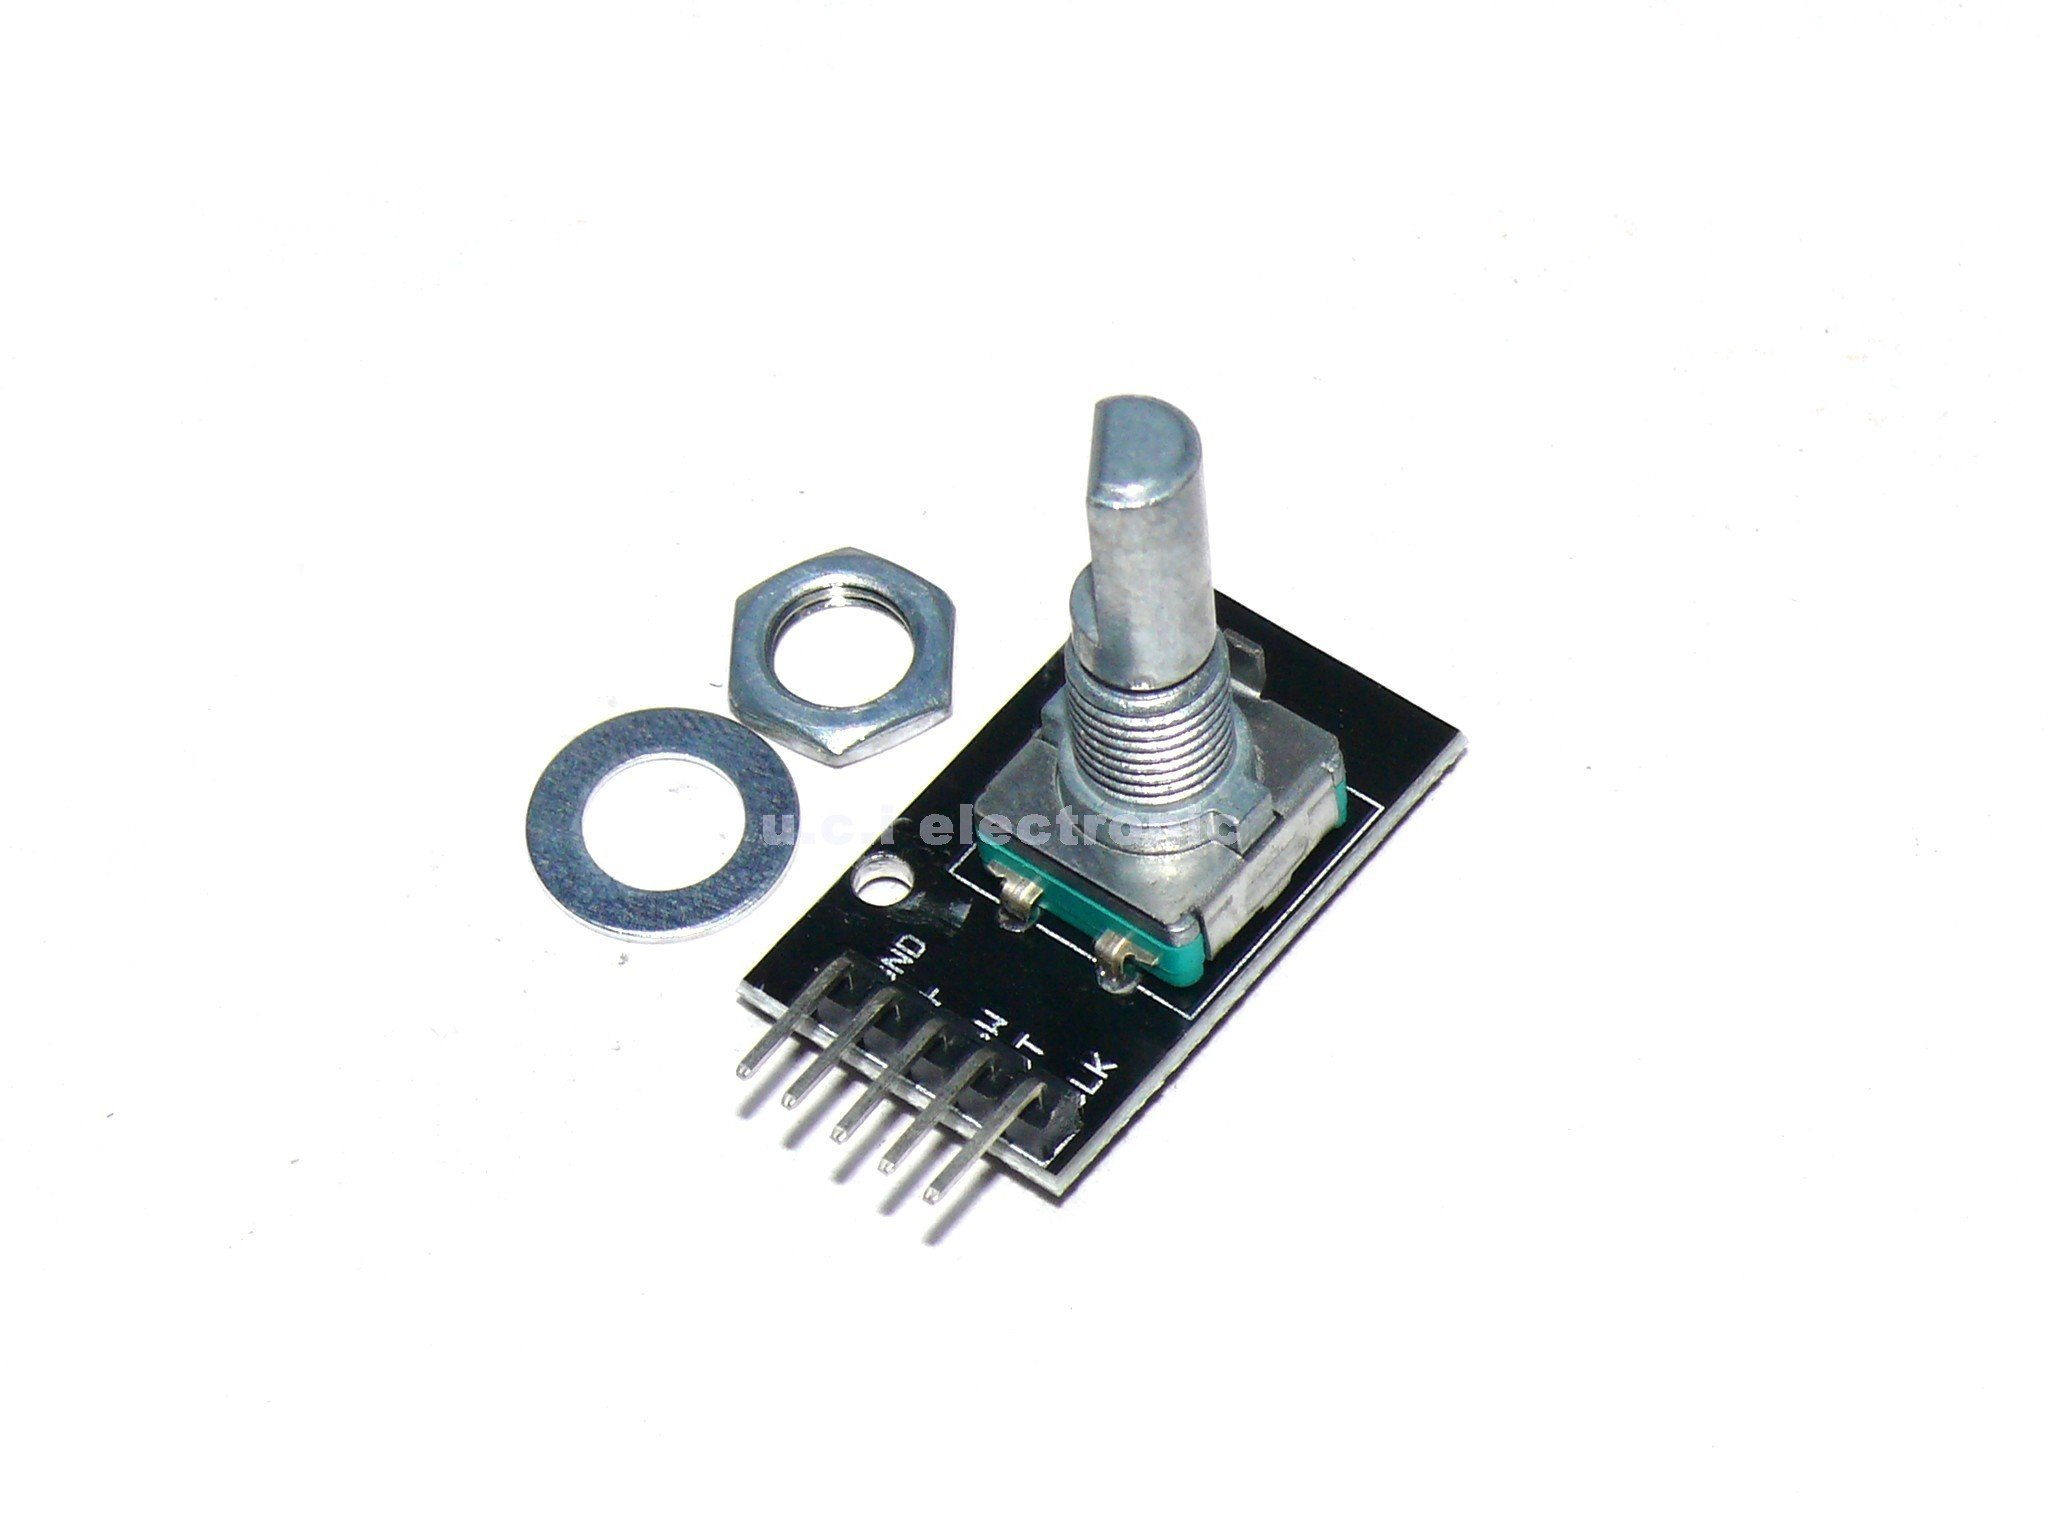 【UCI電子】(10-10) 360度 旋轉編碼器模組 KY-040